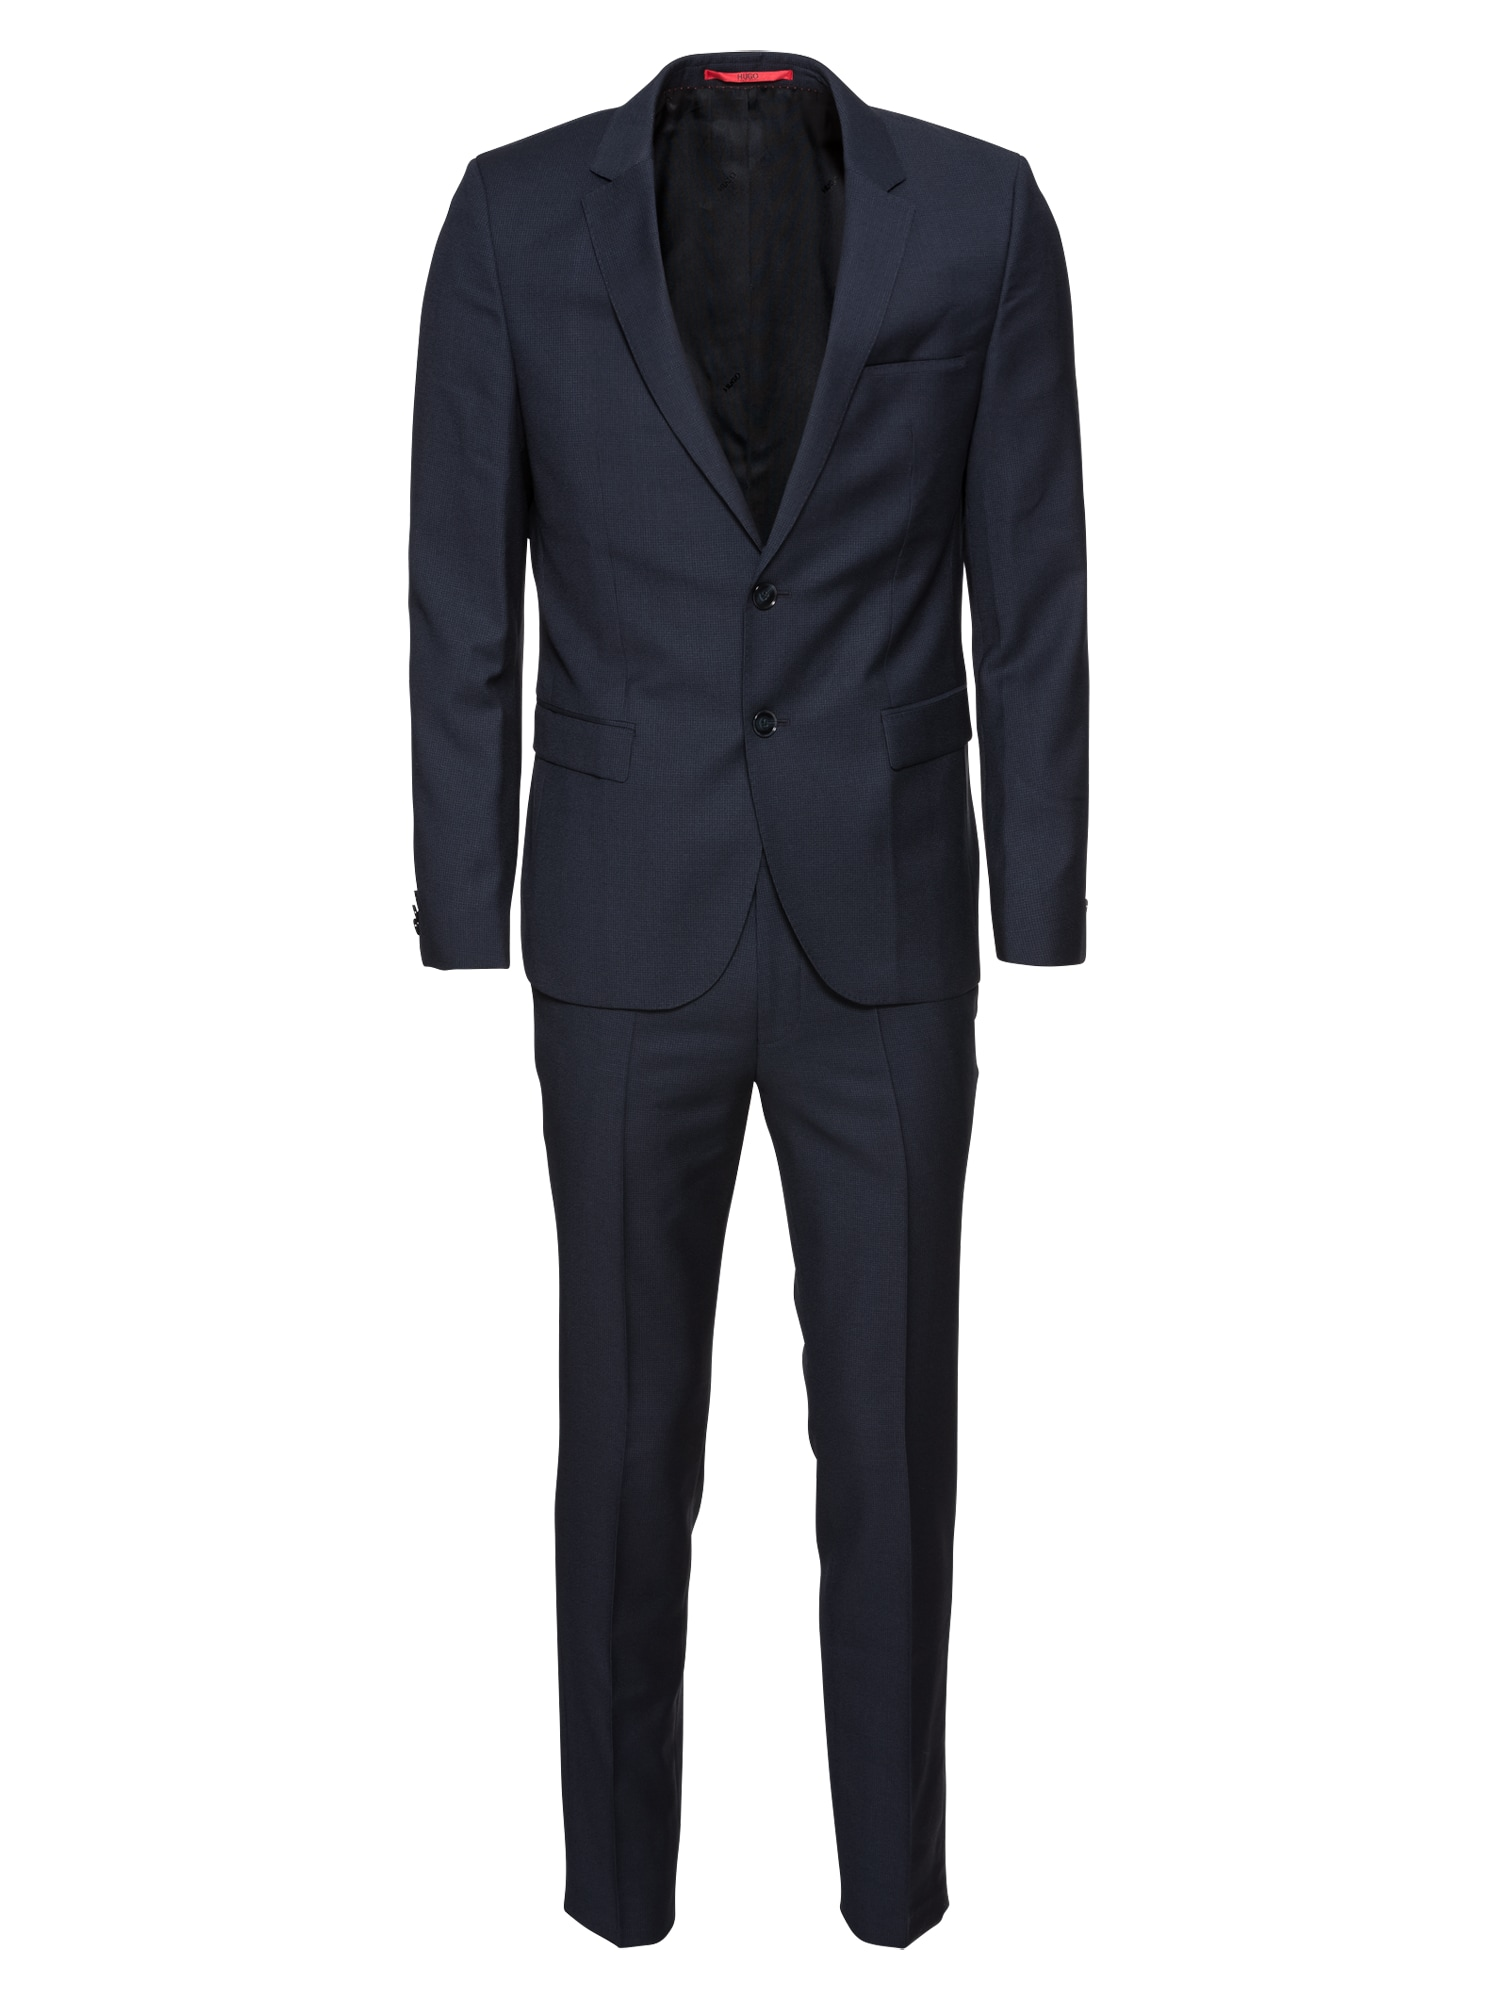 Oblek ArtiHesten182 10210253 01 námořnická modř HUGO